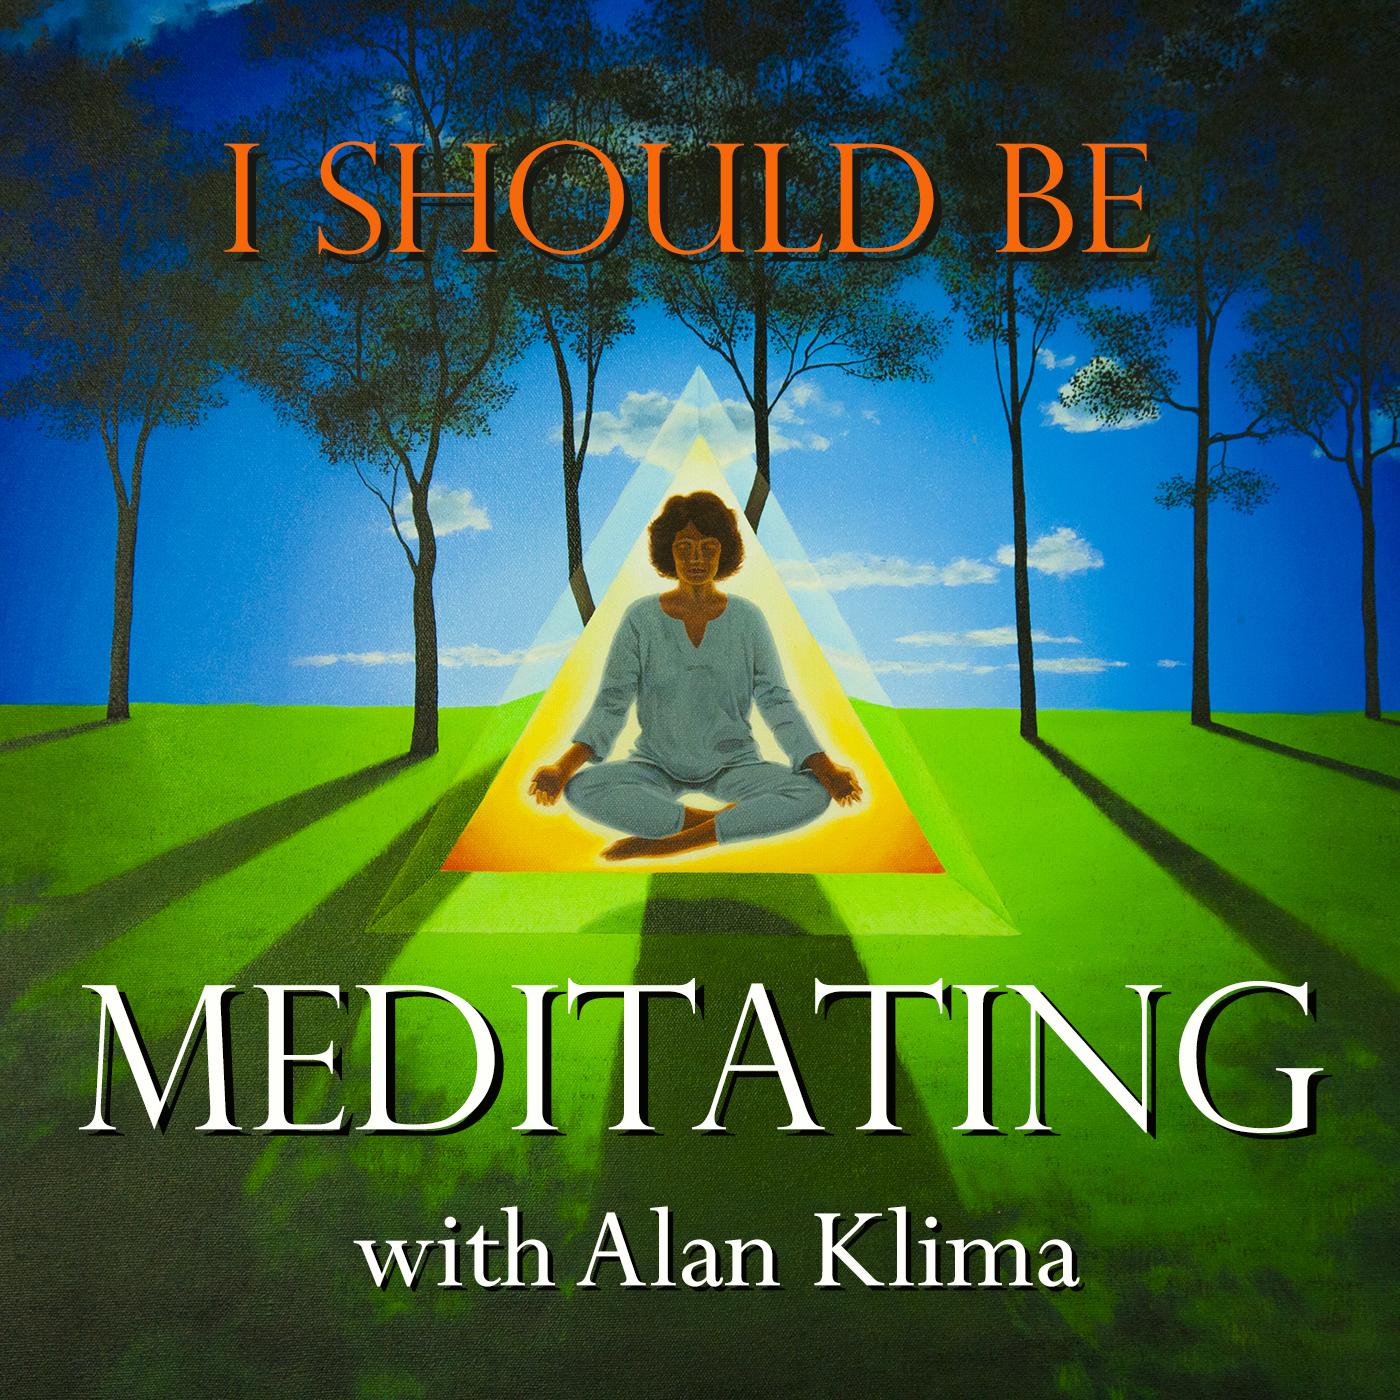 I Should Be Meditating with Alan Klima - Daily Meditation Practice, Questions Answered, and Reflections on Ekhart Tolle, Jack Kornfield, Jon Kabat-Zinn, Mooji, and other teachings from Meditation, Buddhism, Yoga, and Advaita logo